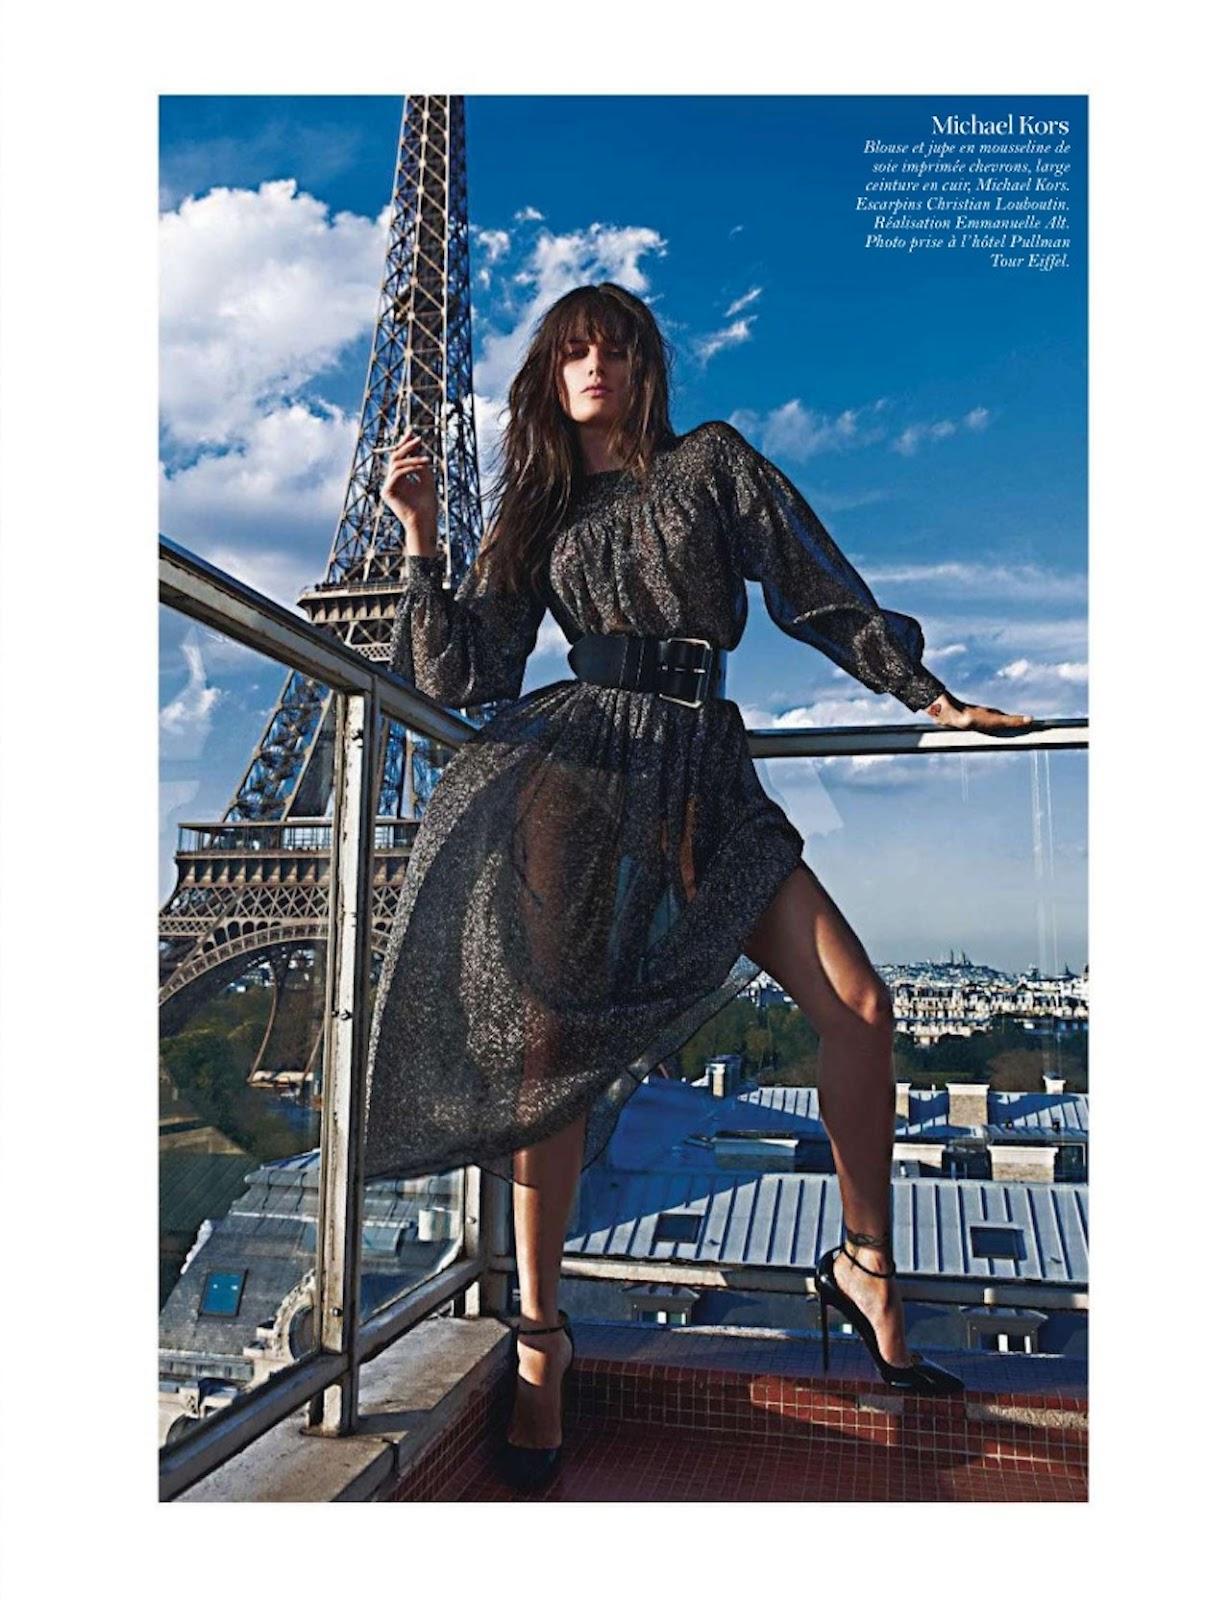 http://4.bp.blogspot.com/-QKHOYi9FQ4E/UAszkLJGPlI/AAAAAAAAIYY/SNIUL-MO1W8/s1600/Paris+Vogue+Aug+2012+Sorrenti+VO62.jpg